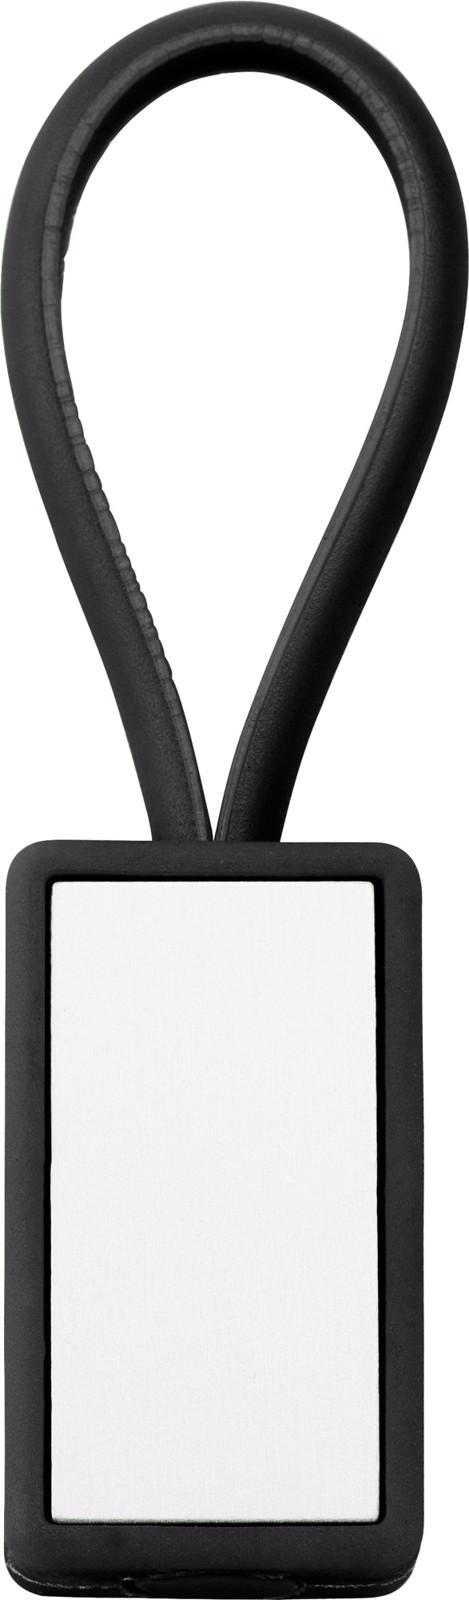 Plastic key holder - Black